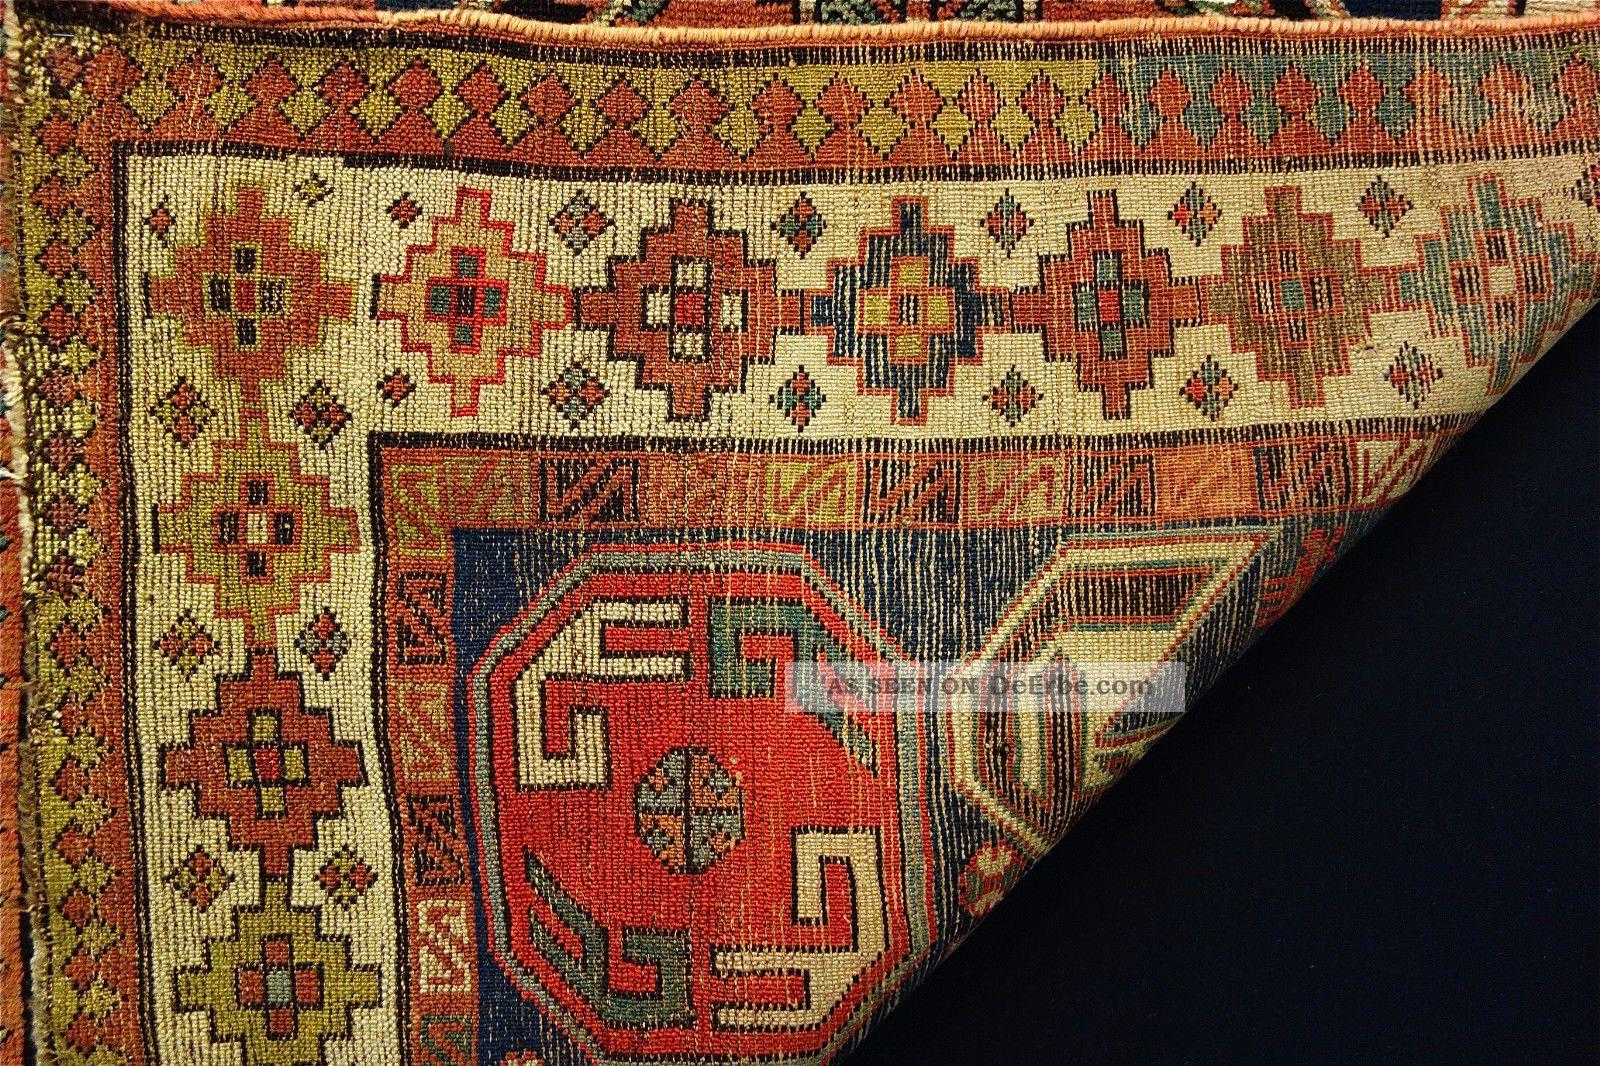 Antike Lenkoran Teppich  Old (lenkoran) Carpet